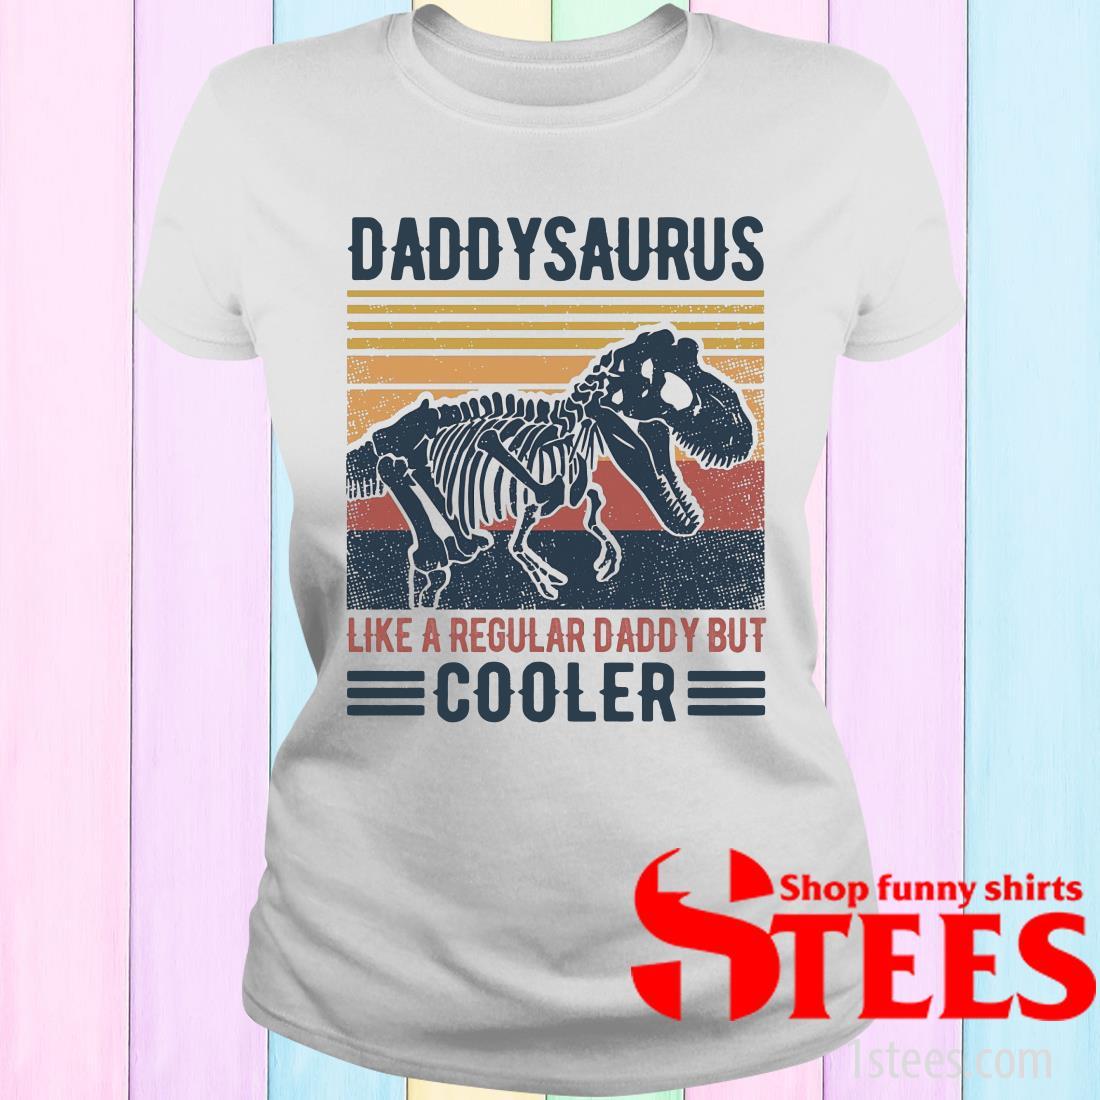 Daddysaurus Like A Regular Daddy But Cooler Vintage Women's T-Shirt